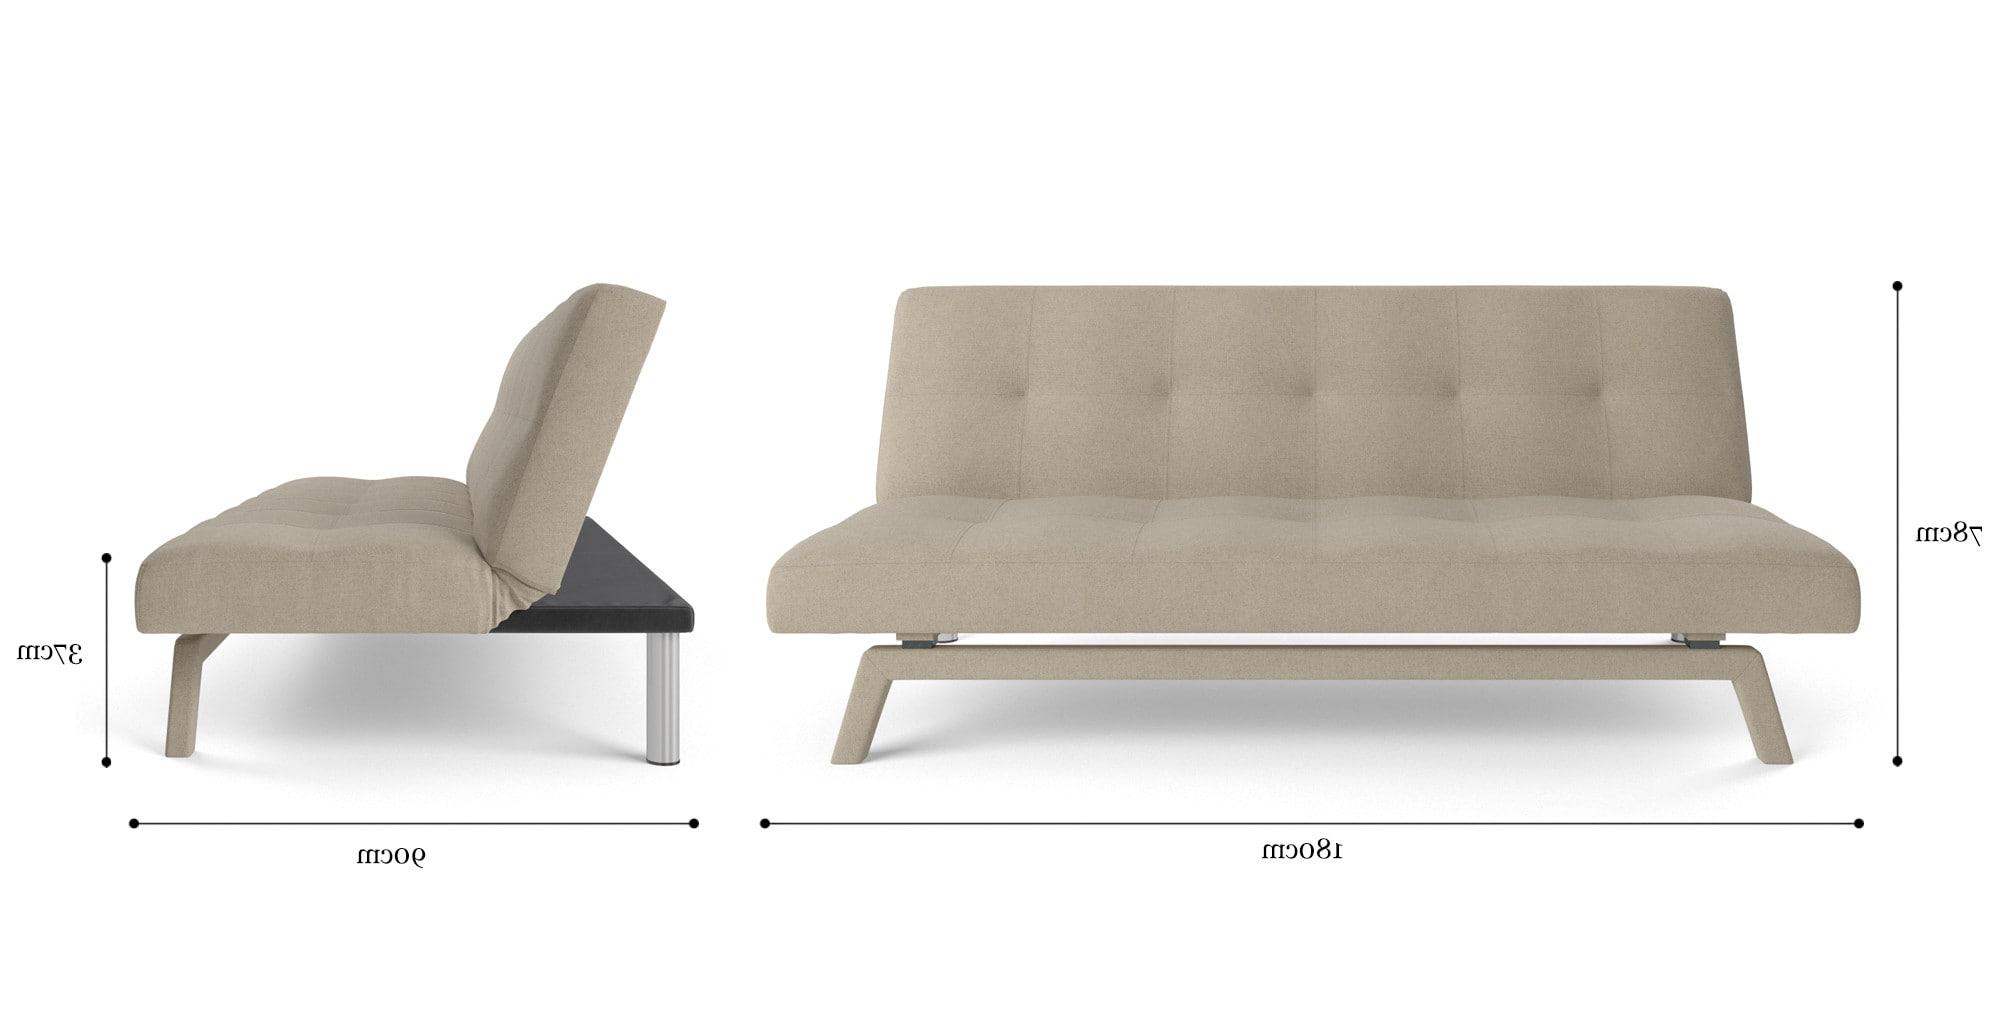 Trendy Buy Milo Sofa Bed Online In Australia (View 4 of 20)